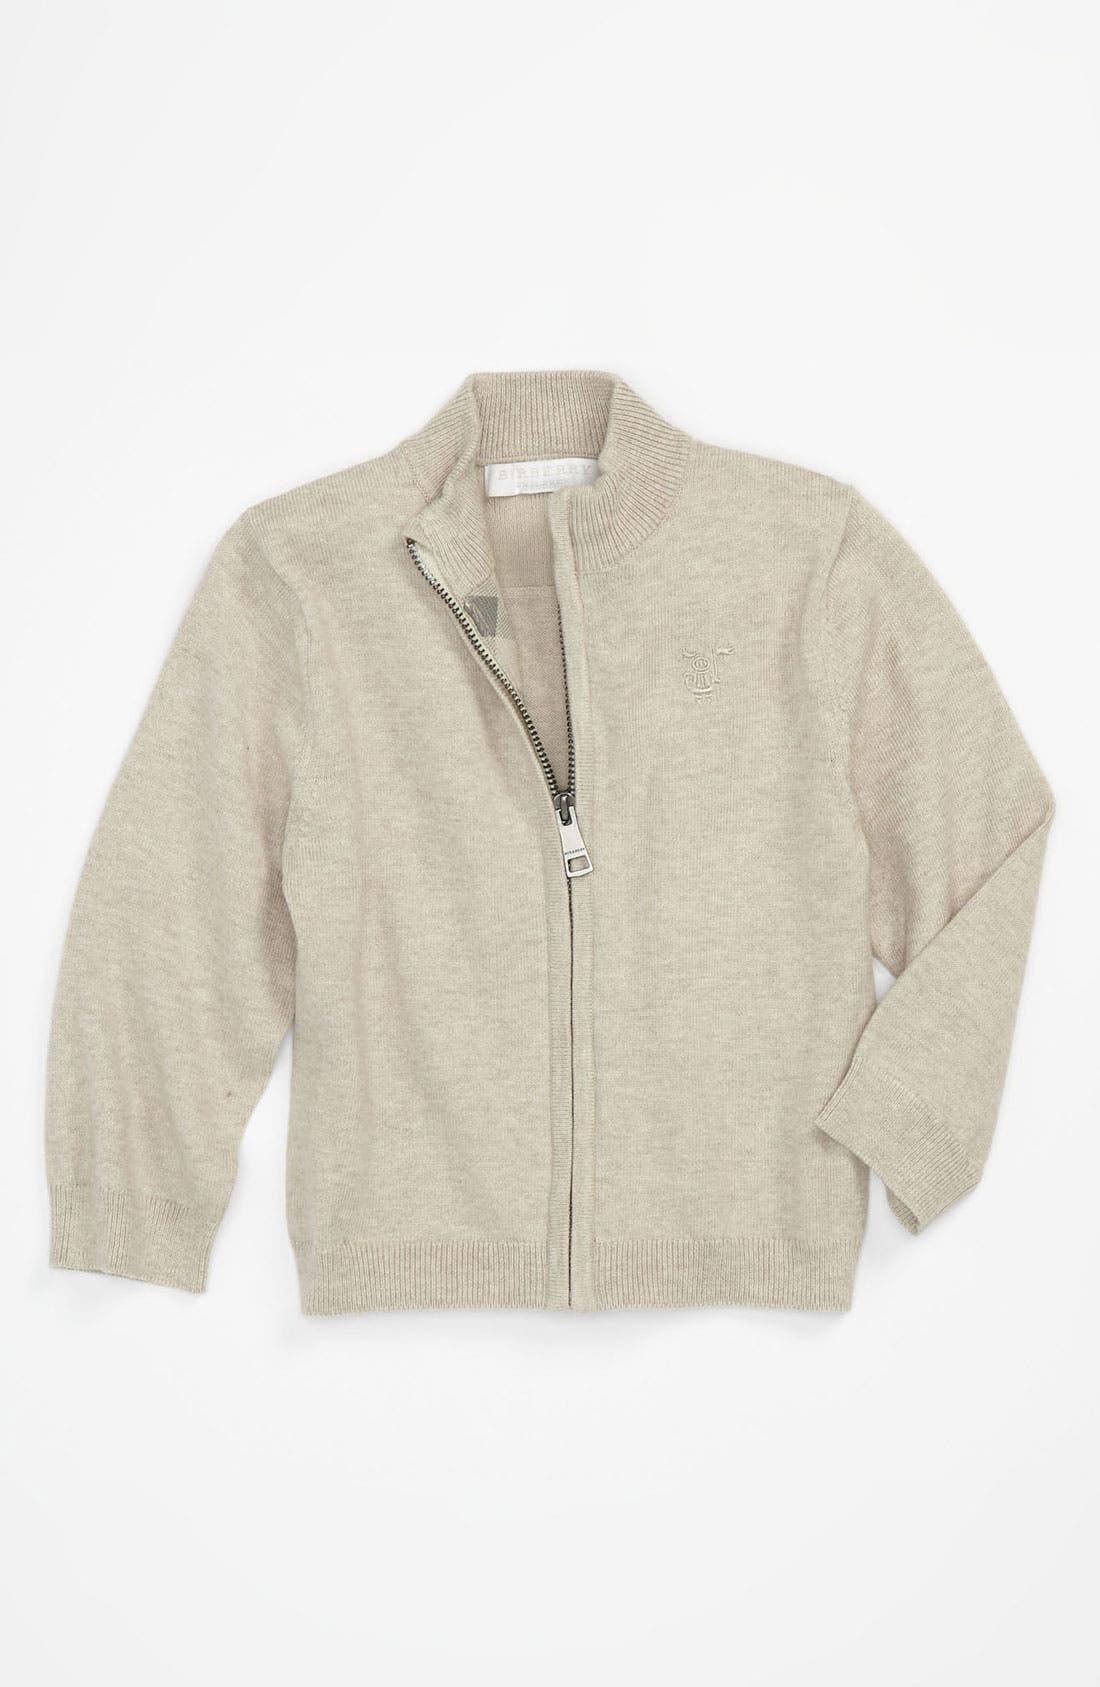 Alternate Image 1 Selected - Burberry Zip Cardigan (Infant)